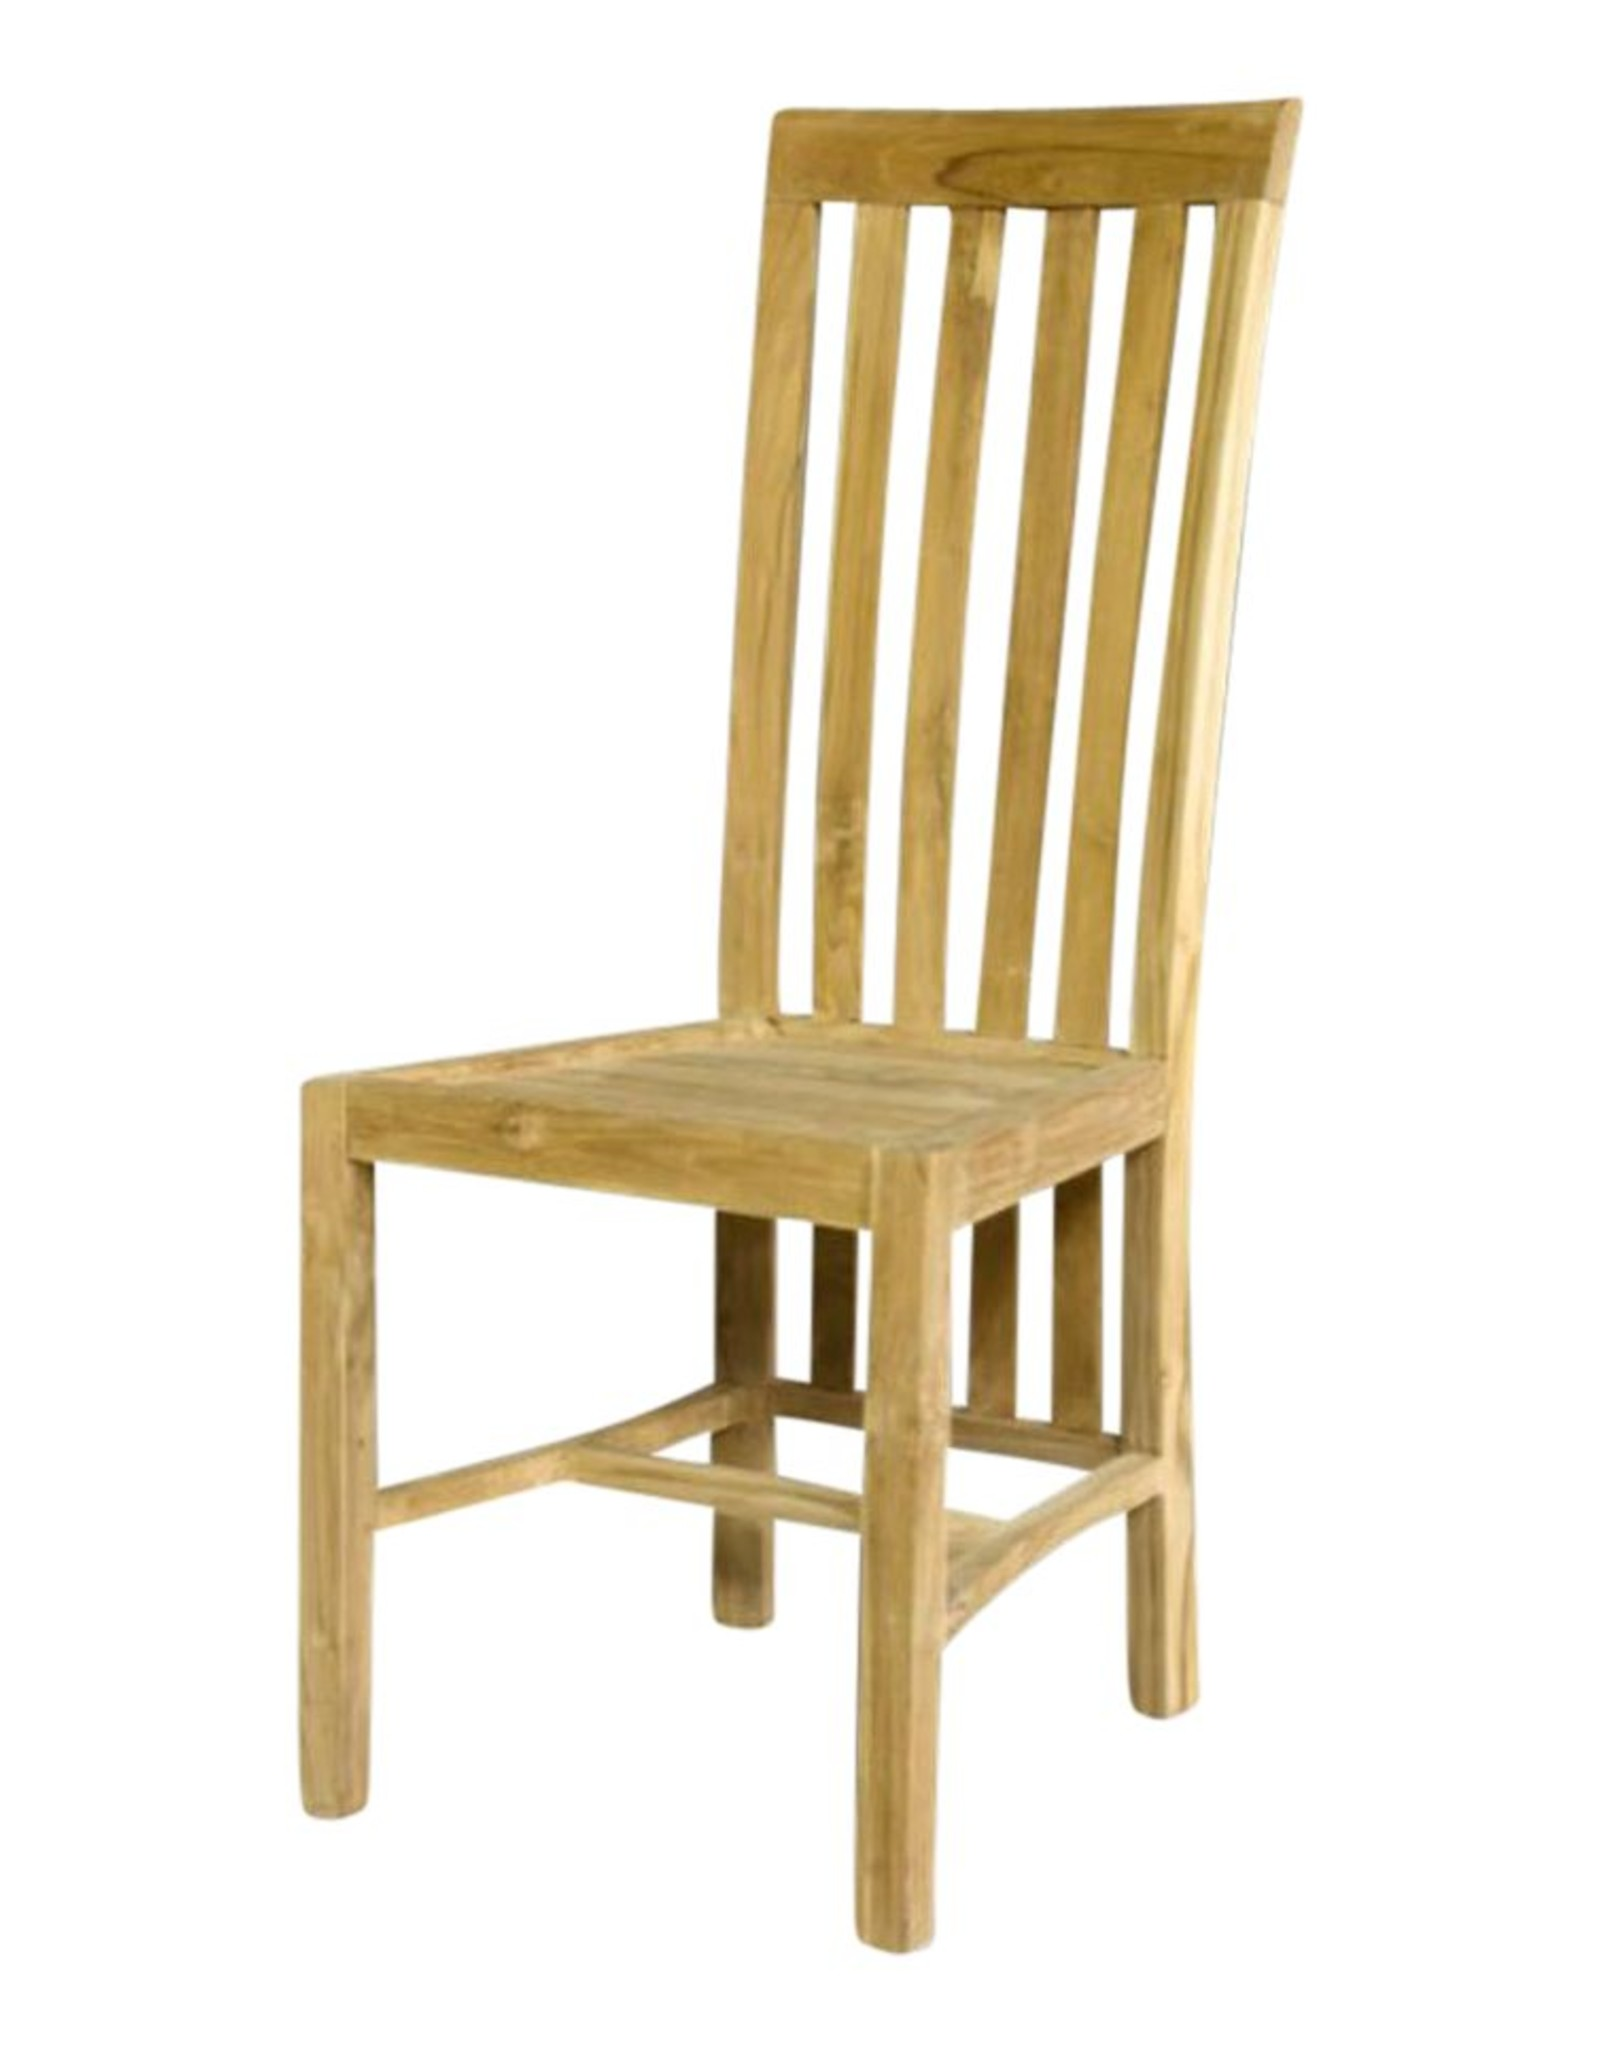 Stoel in teak: Balero chair